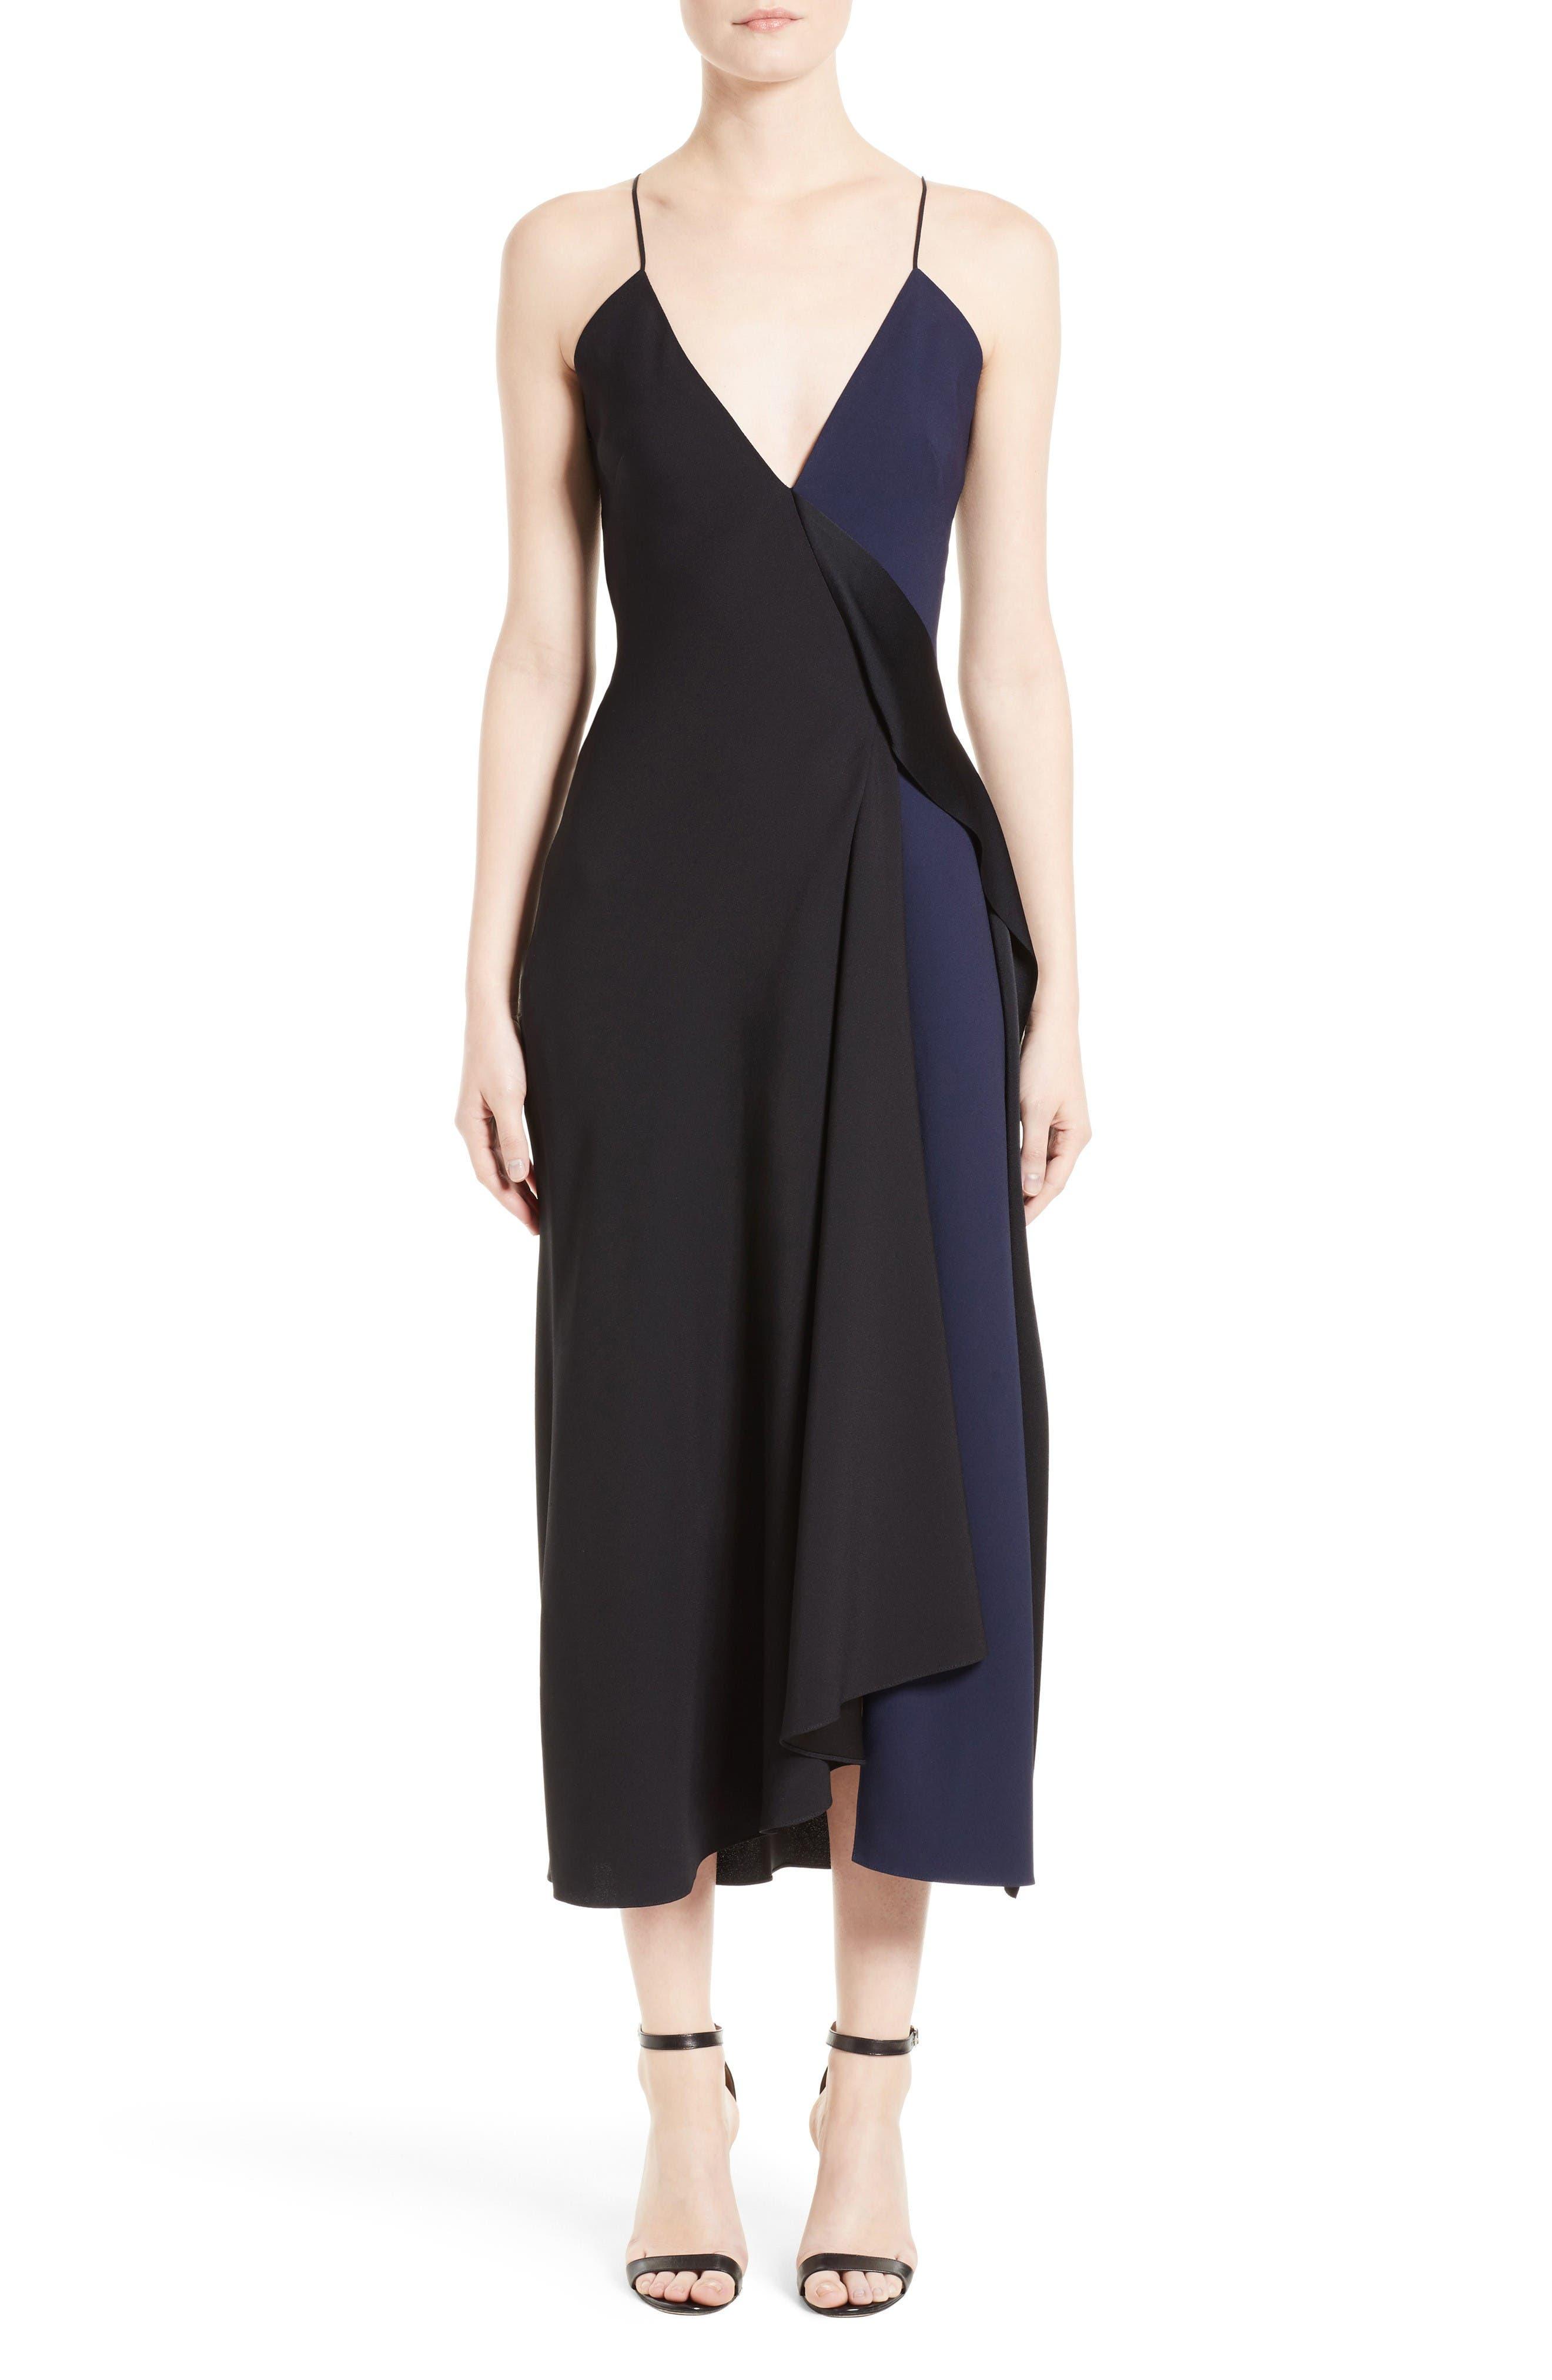 Alternate Image 1 Selected - Victoria Beckham Asymmetrical Camisole Dress